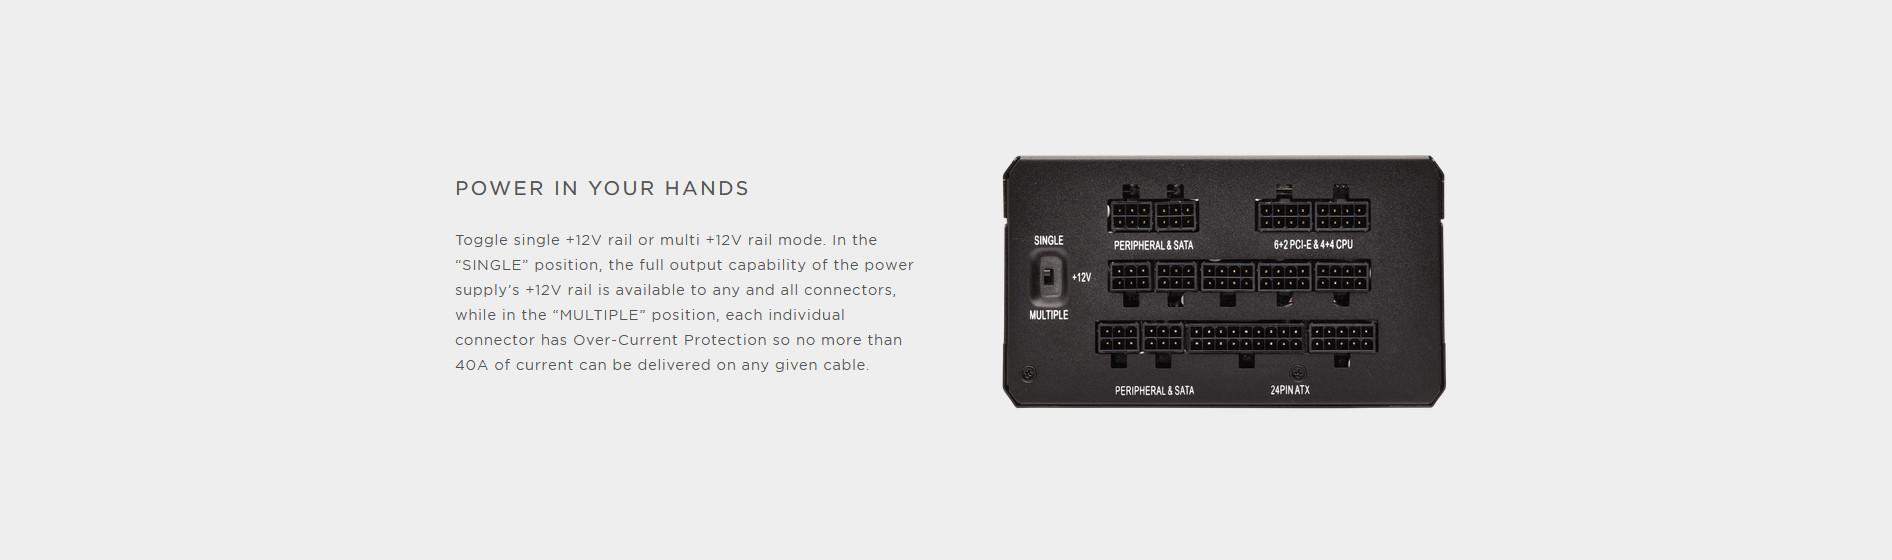 Nguồn Corsair HX850 850W (80 Platinum/Màu Đen/Full Modul) giới thiệu 4